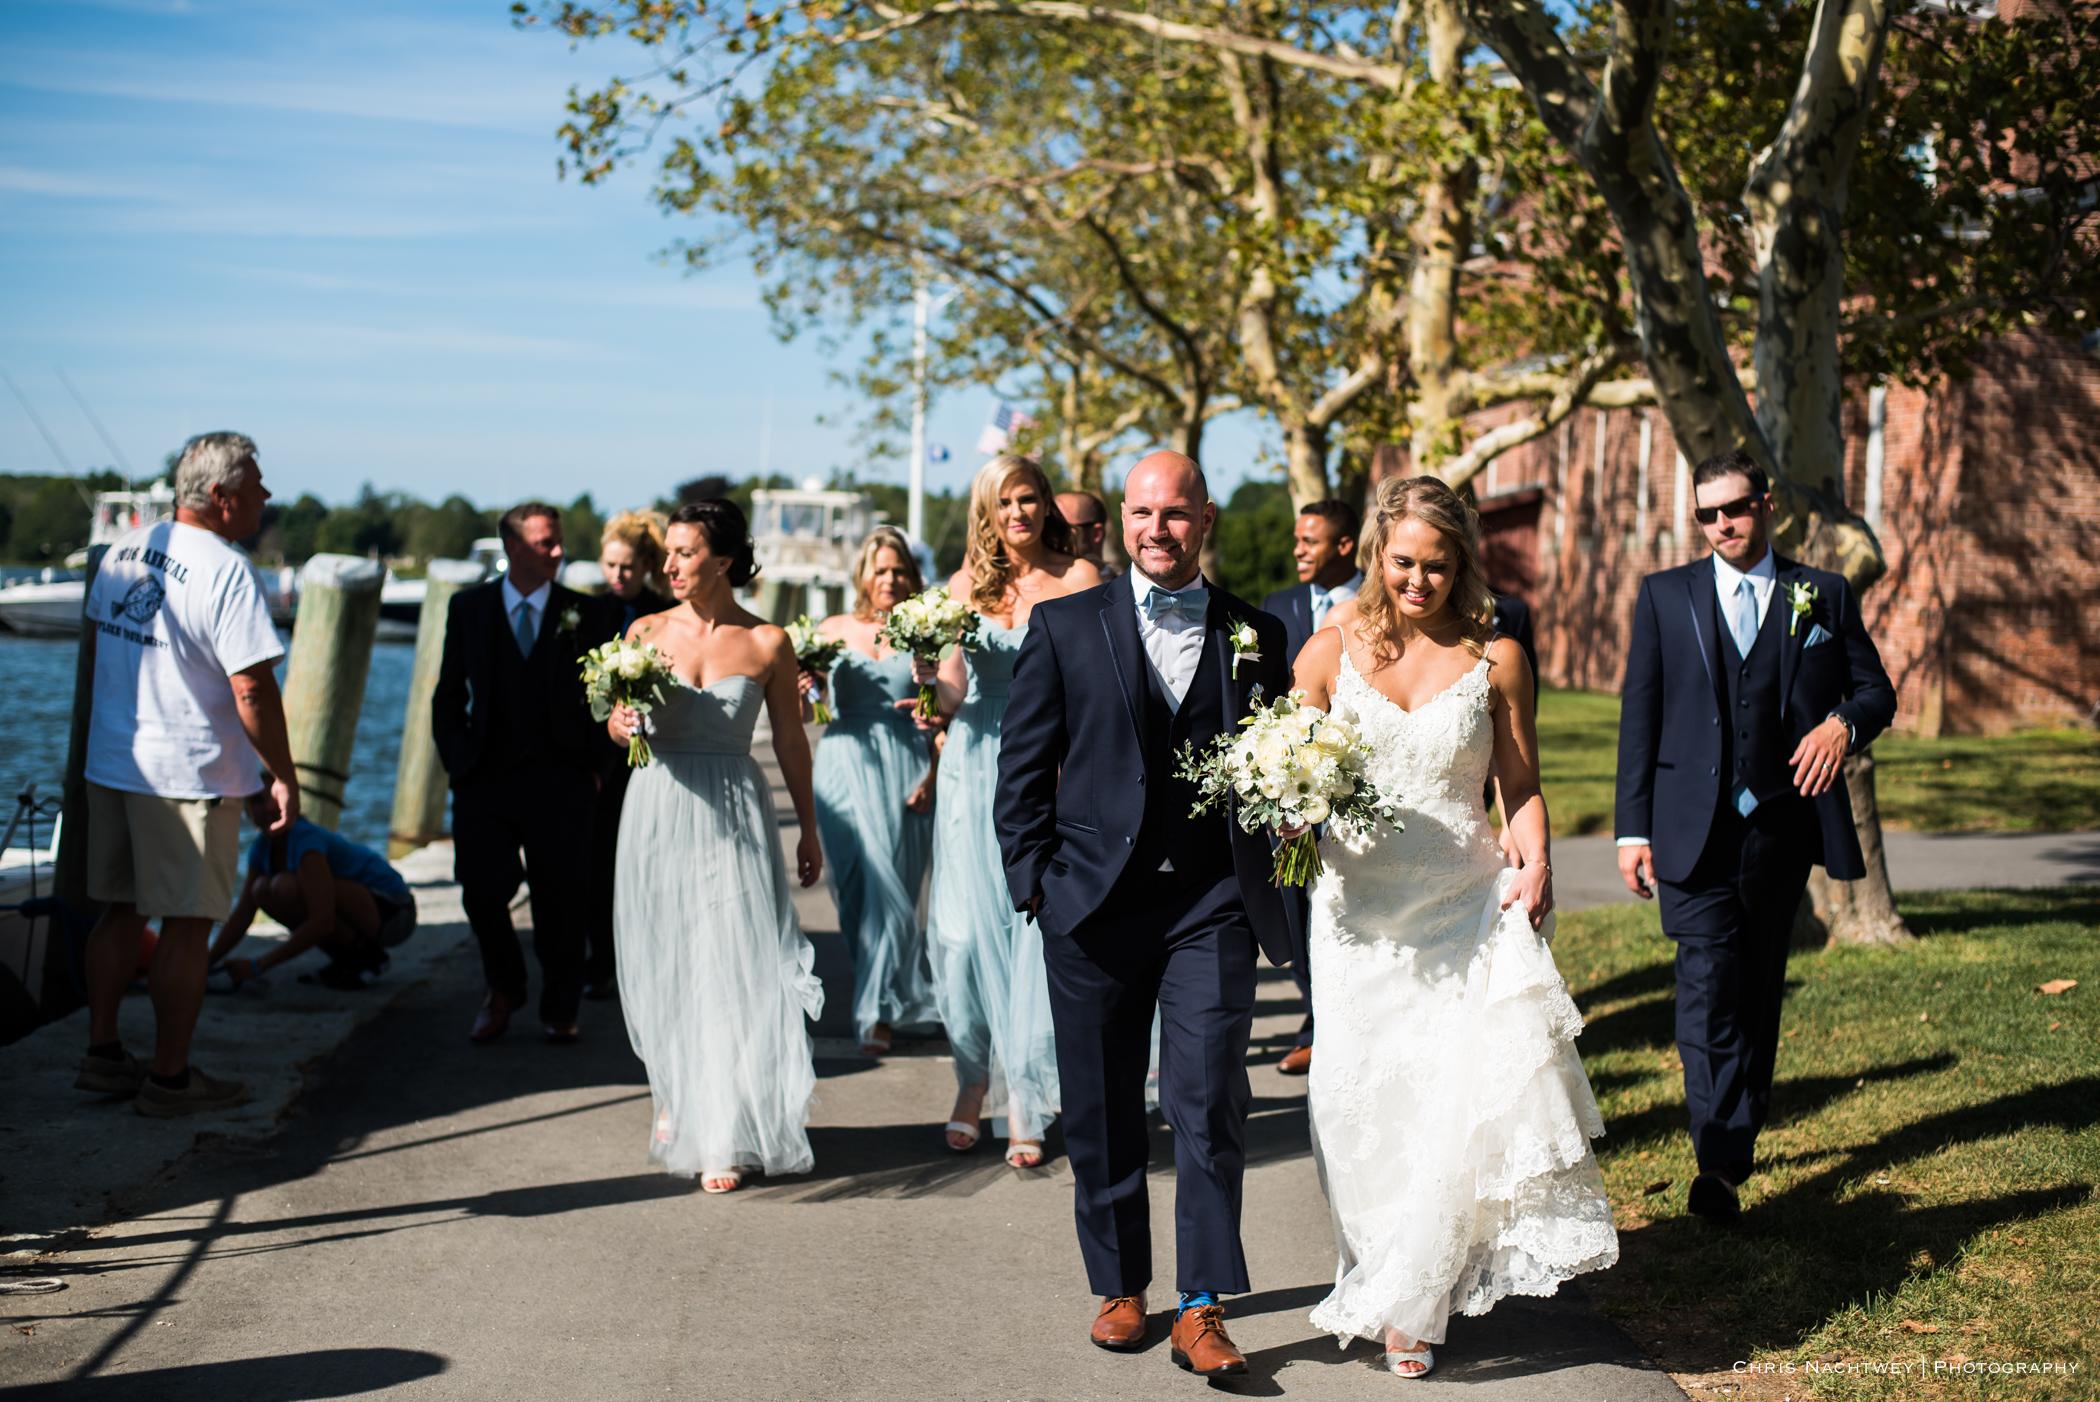 mystic-ct-artistic-wedding-photographers-chris-nachtwey-tany-mike-2017-12.jpg